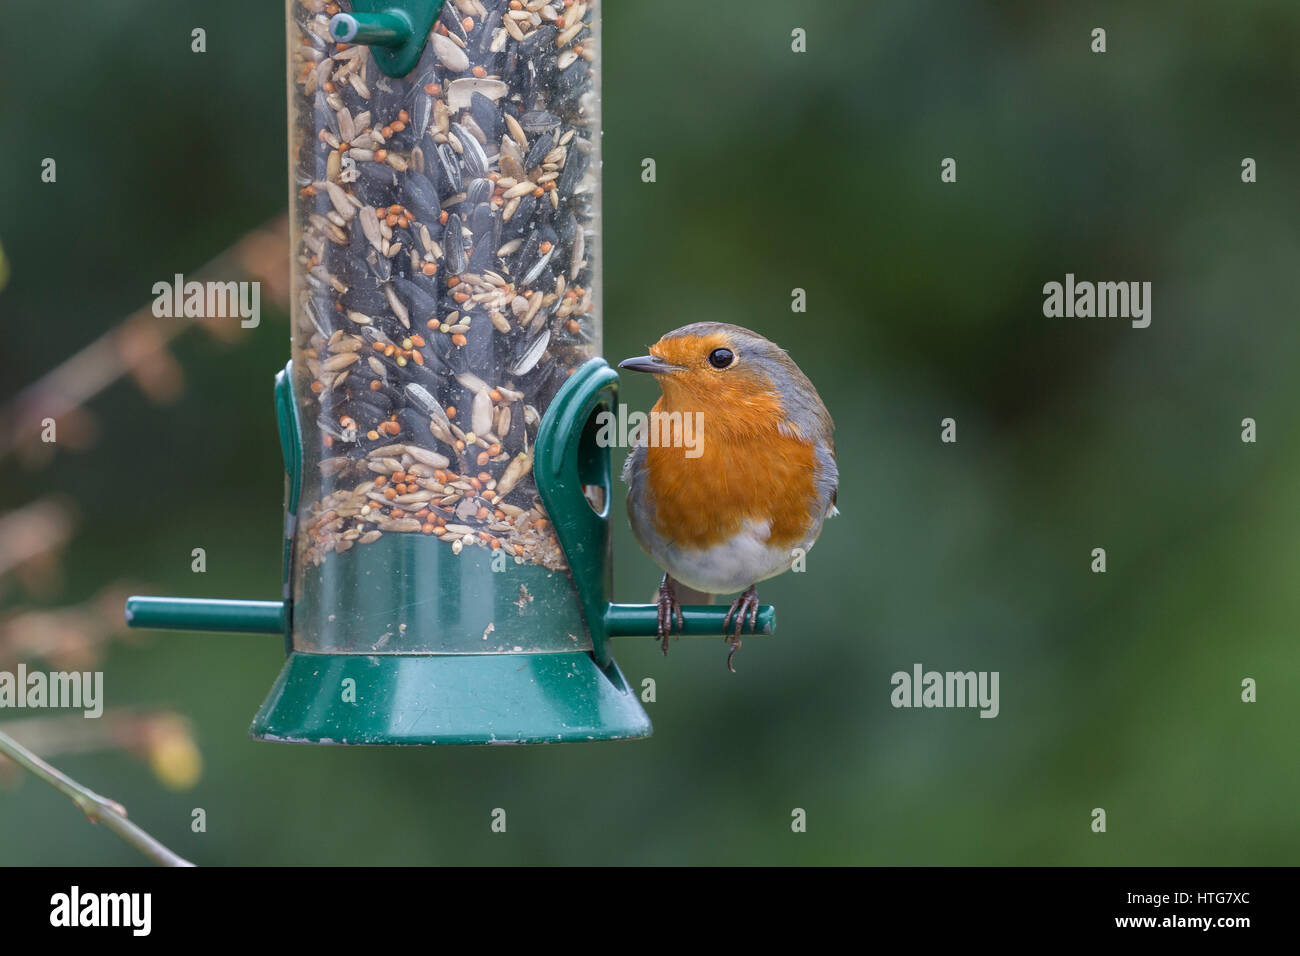 European Robin, Erithacus rubecula, on seed feeder. - Stock Image